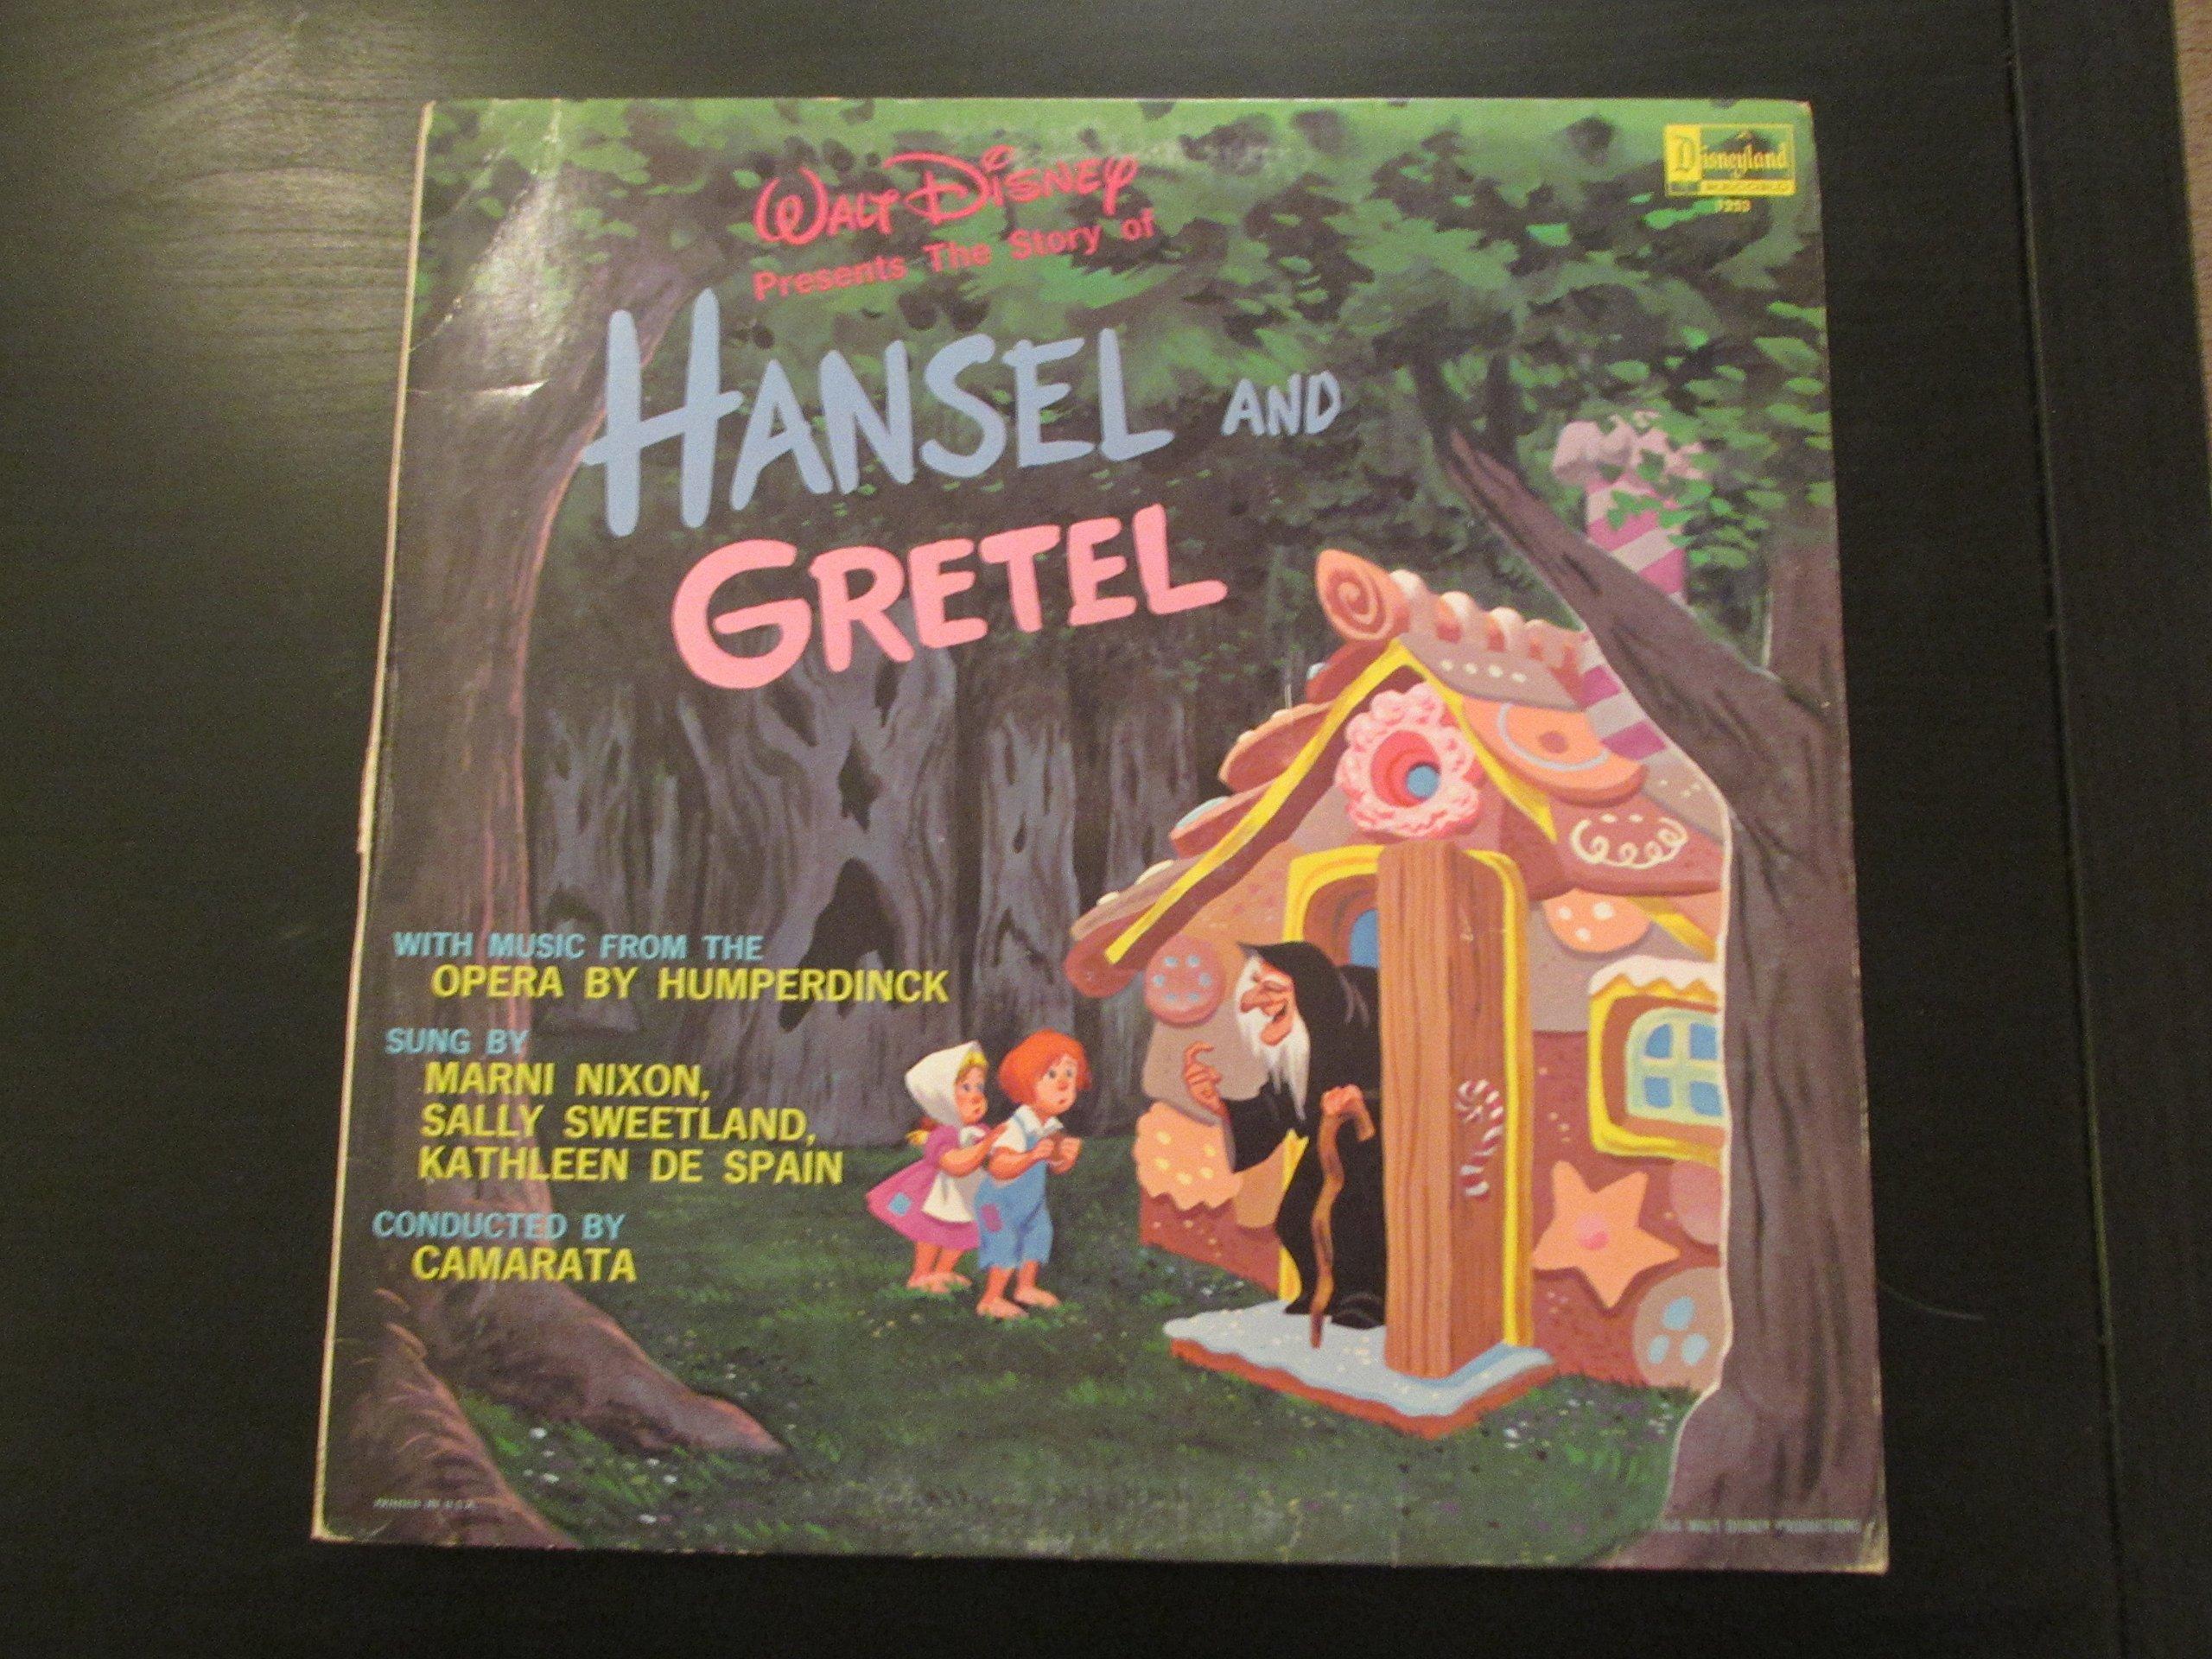 Walt Disney Presents The Story of Hansel and Gretel by Disneyland (1964)